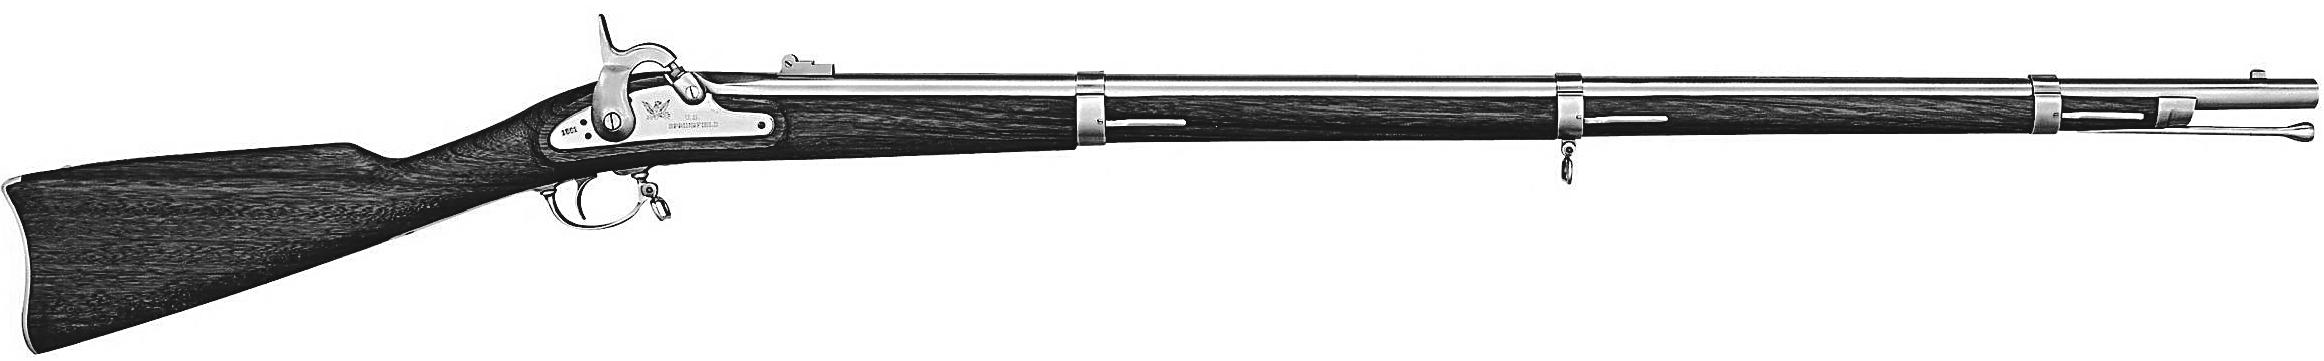 Springfield 1861 Rifle